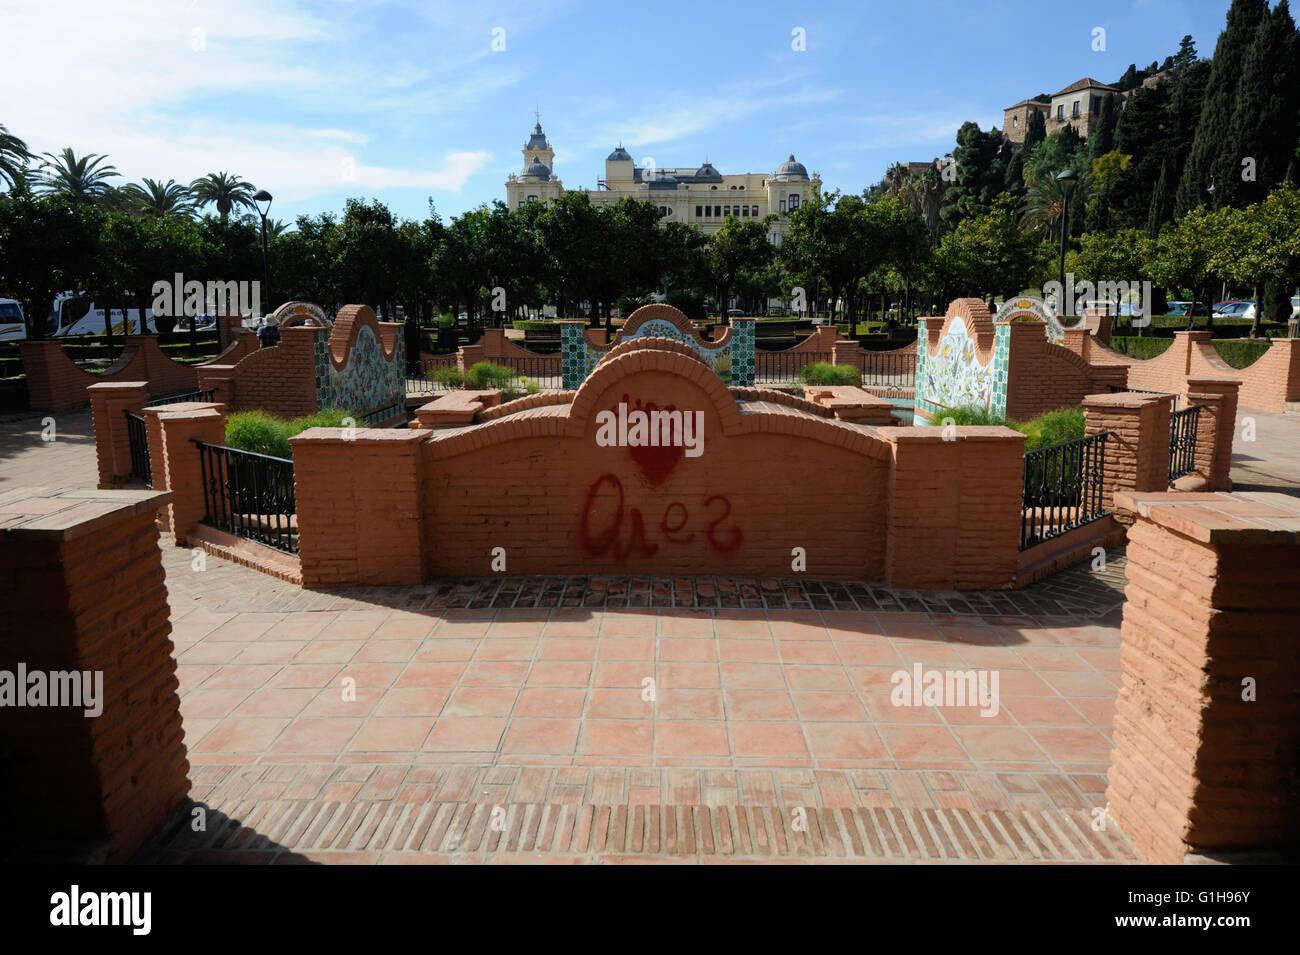 Garden in Alameda, Malaga Spain - Stock Image